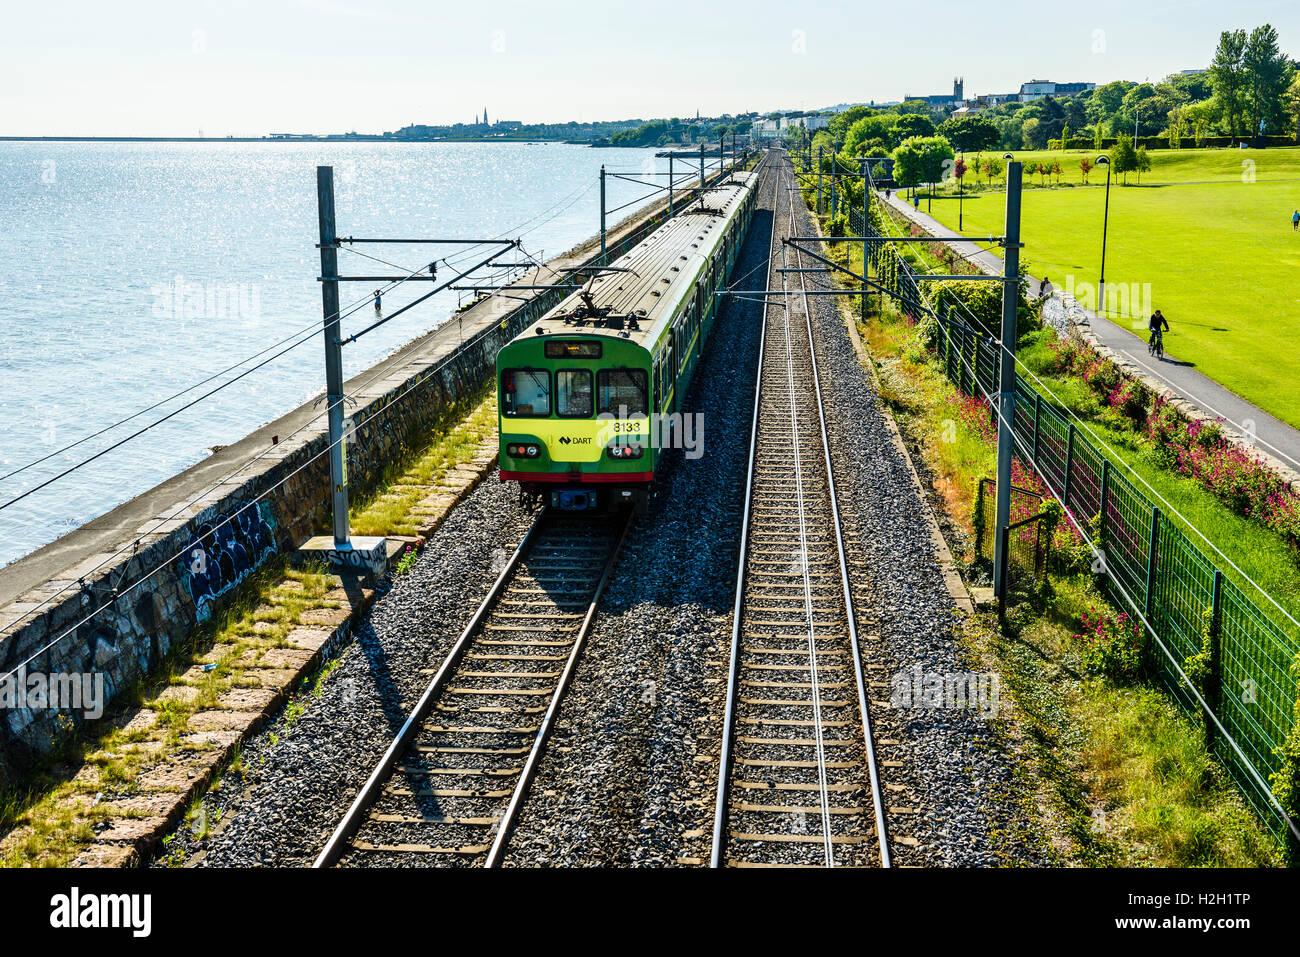 Commuter train between Booterstown and Blackrock Dublin Ireland - Stock Image